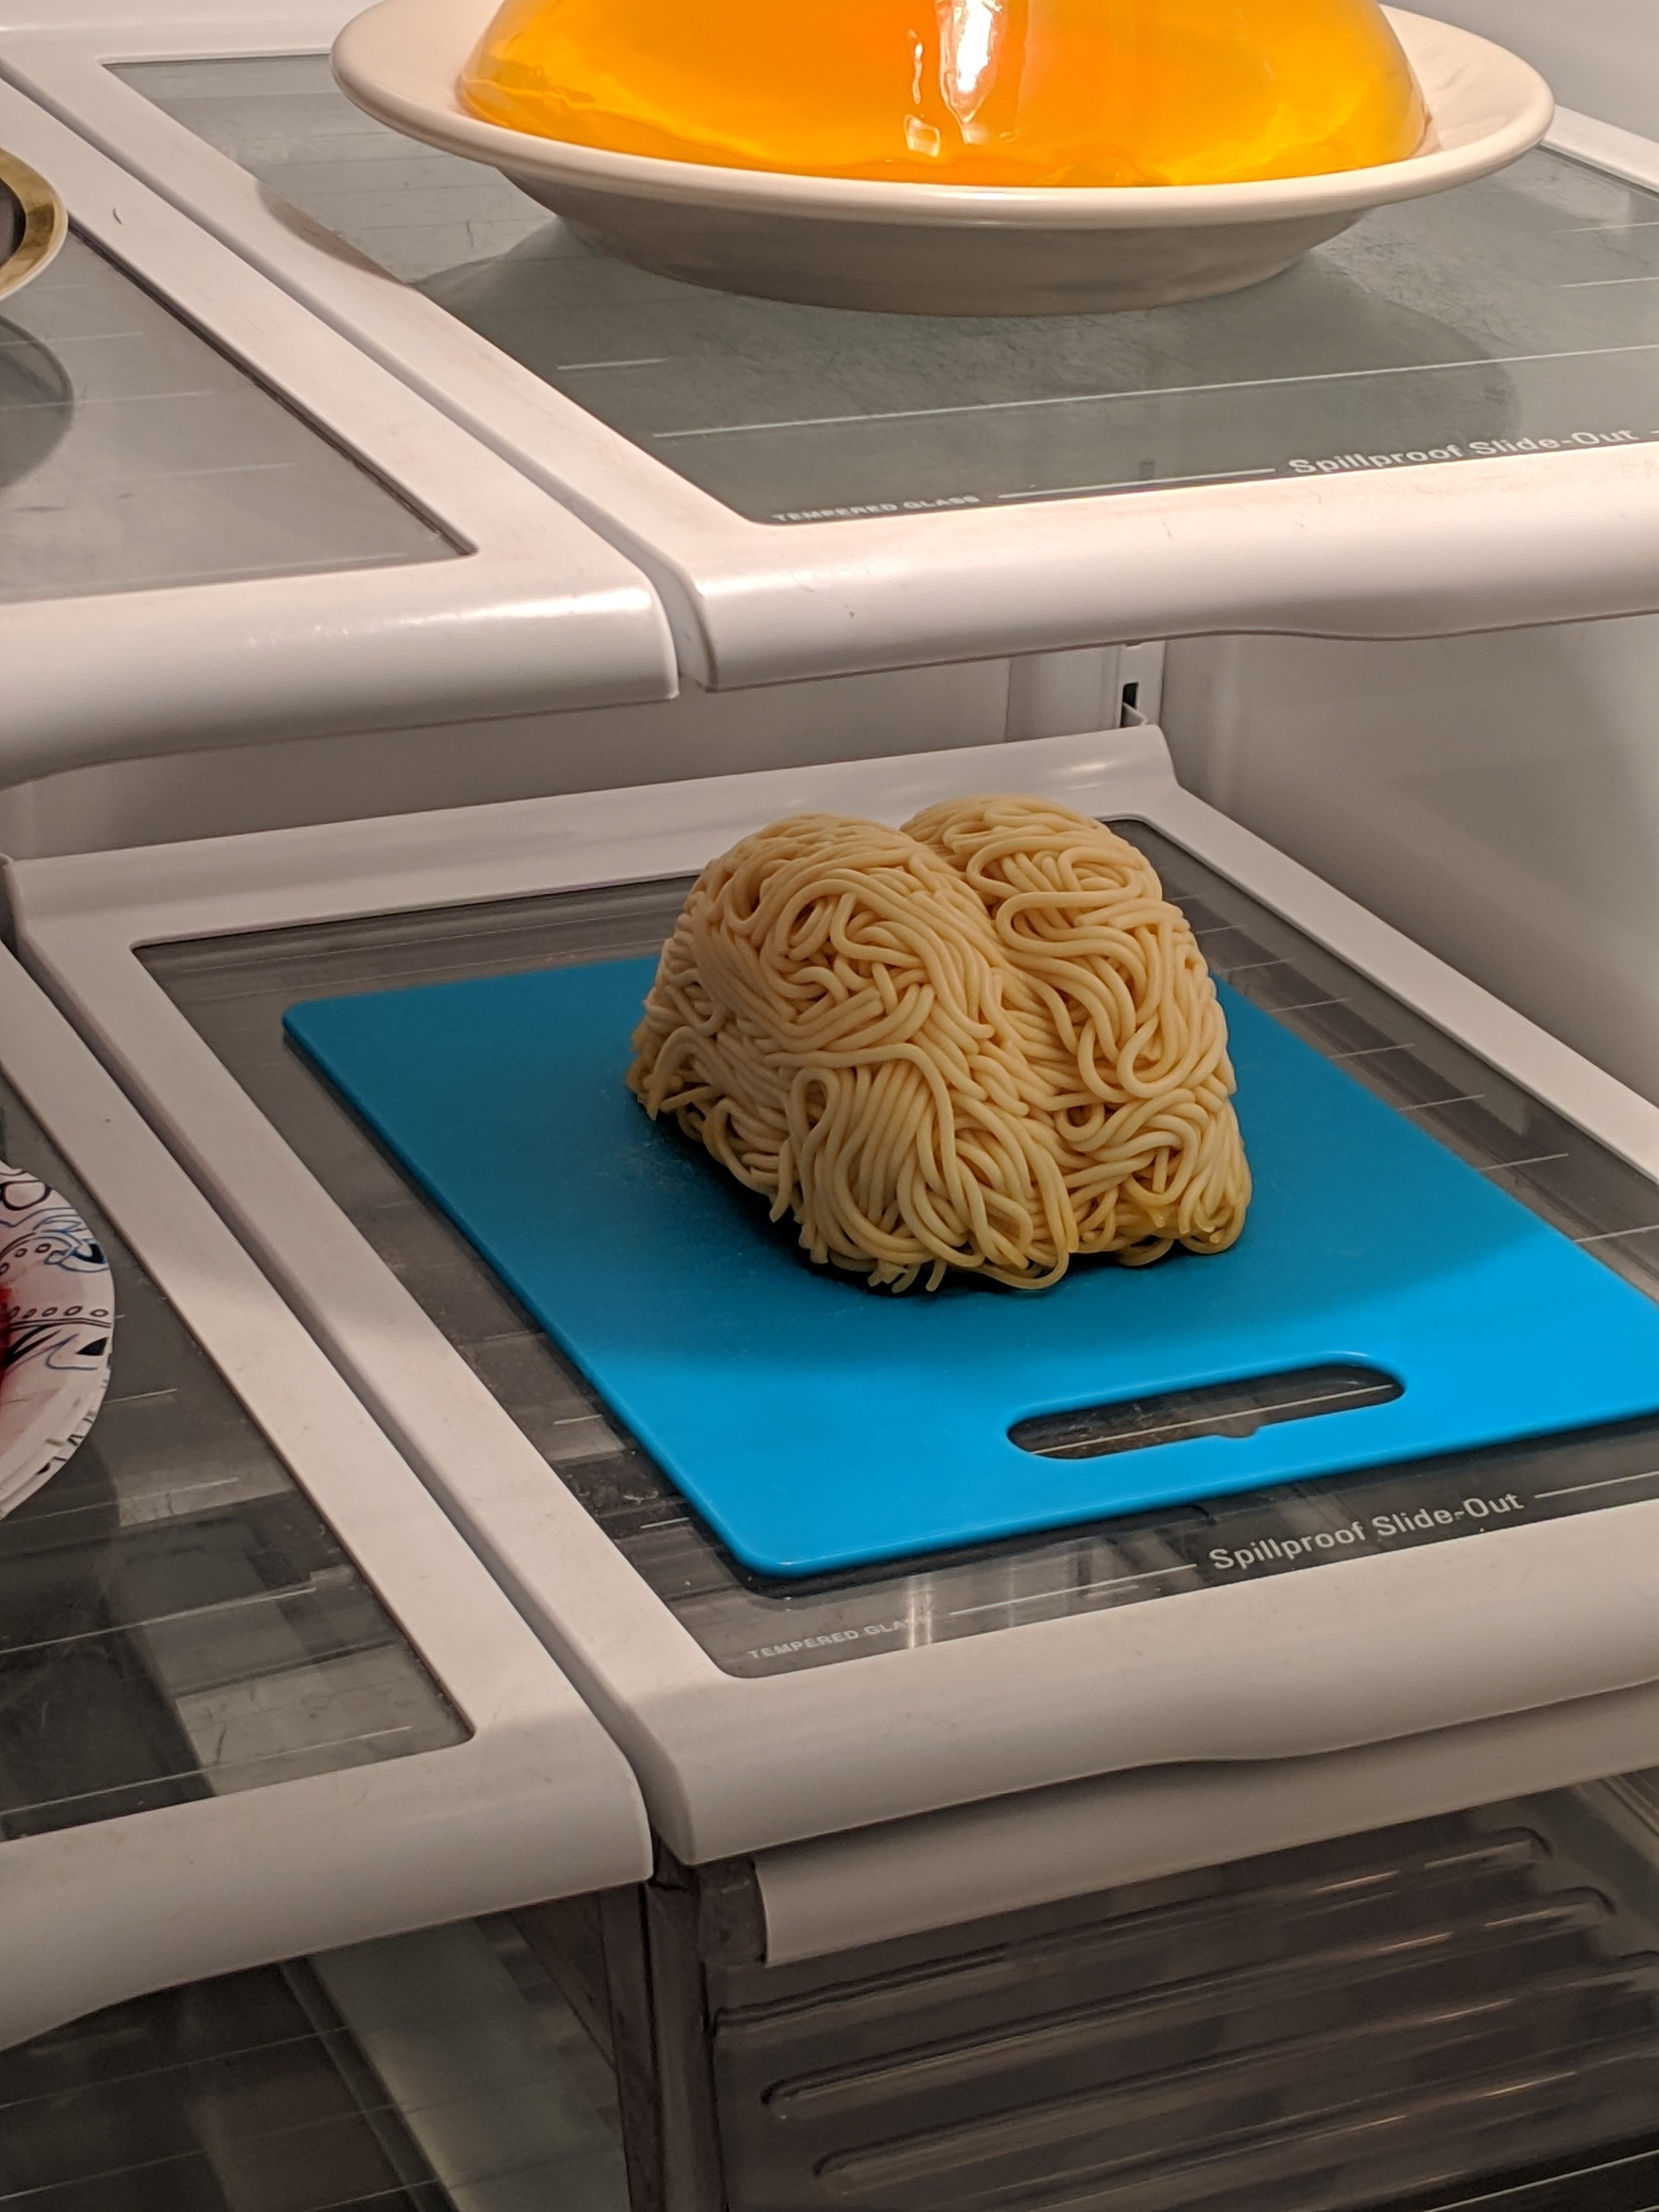 Kamen_Foxen_Yesterdays_Spaghetti.jpg